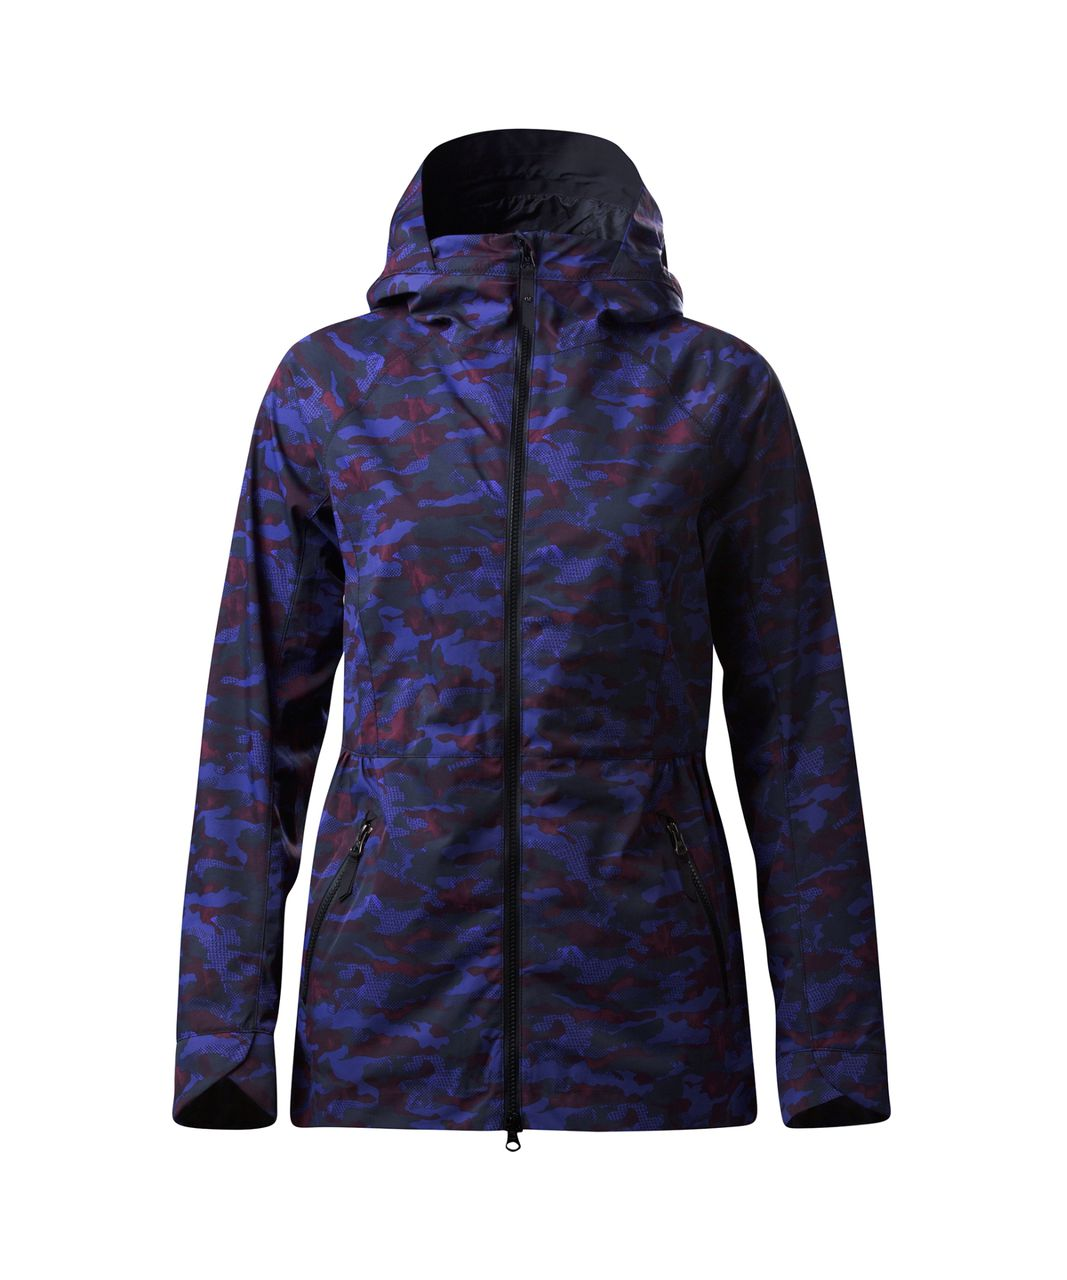 Lululemon Rain For Daze Jacket II - Hounds Camo Emperor Blue Black